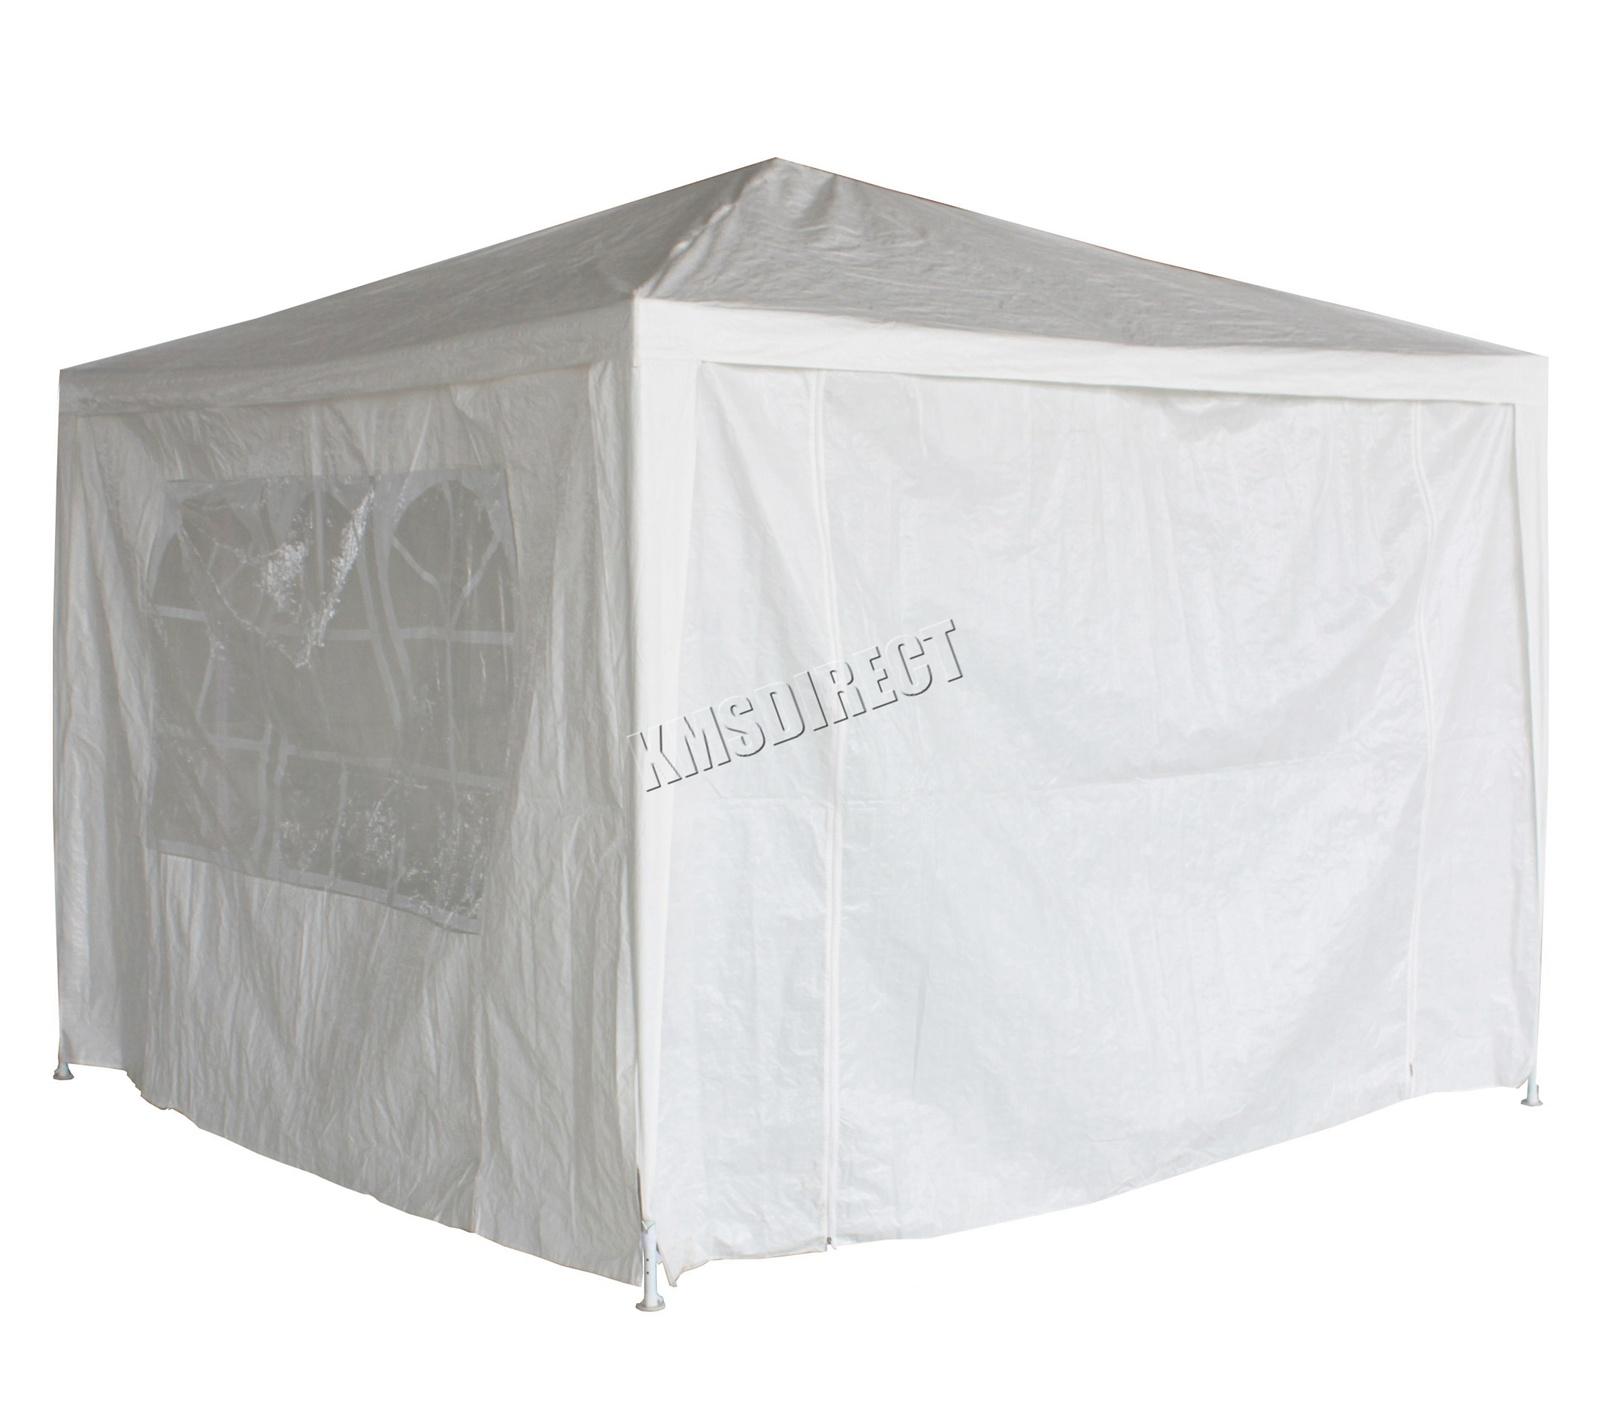 New-3-x-3m-120g-Waterproof-Outdoor-PE-Garden-Gazebo-Marquee-Canopy-Party-Tent Indexbild 30